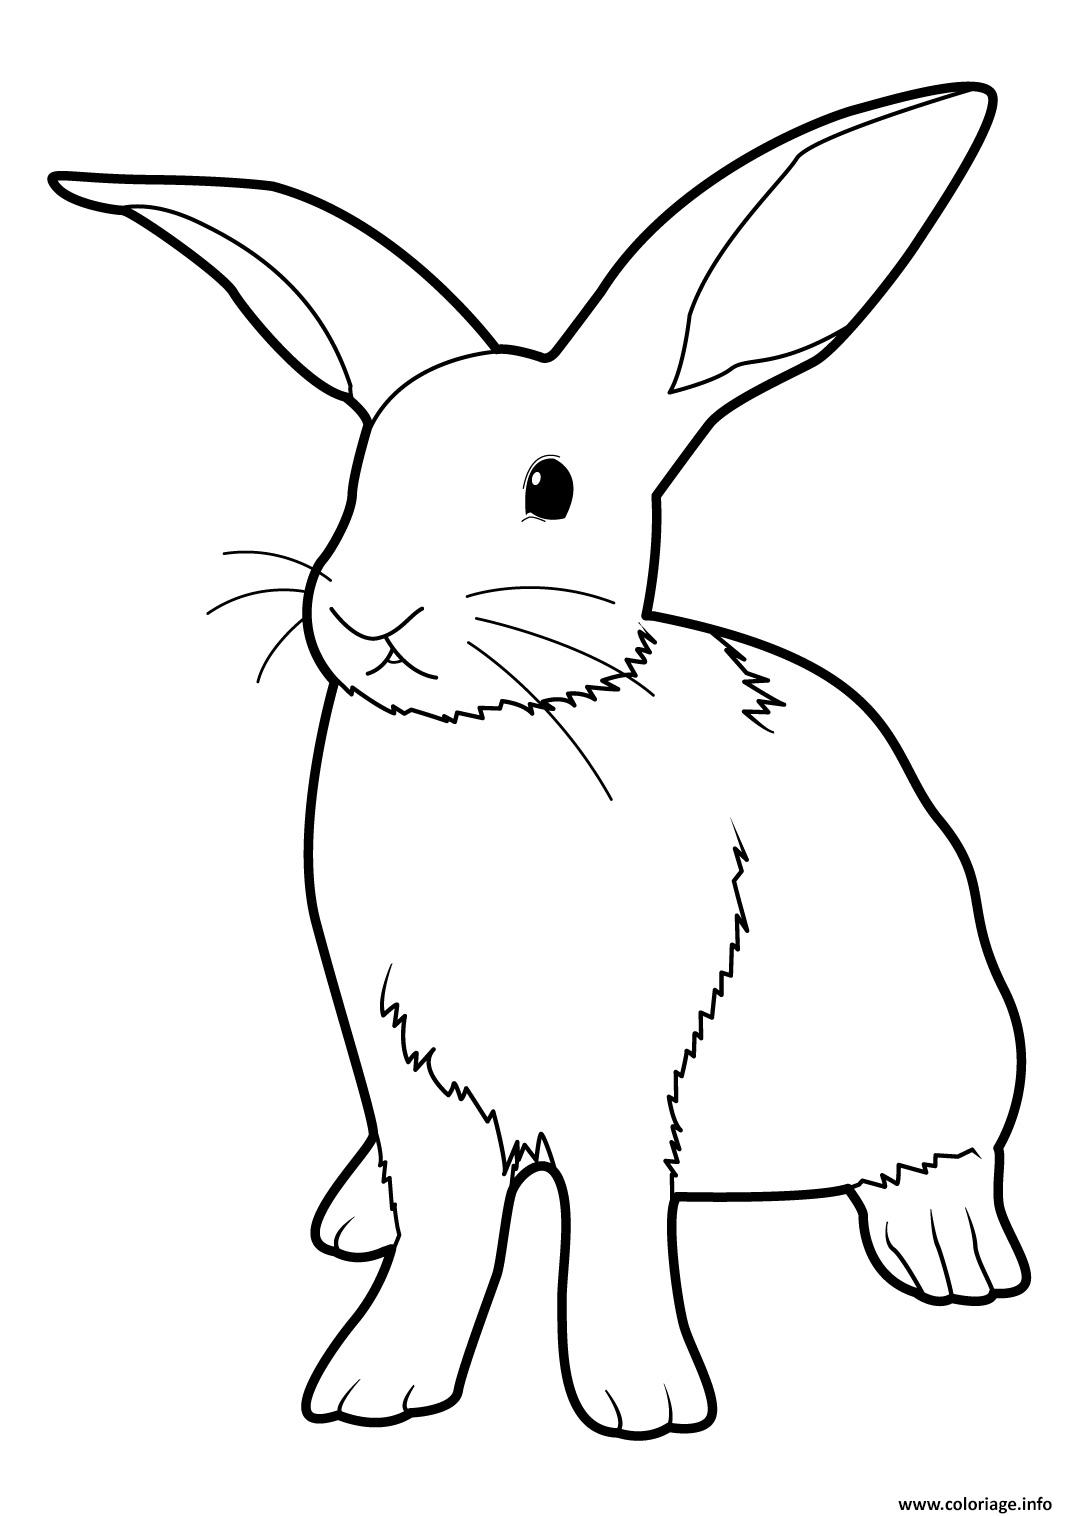 Coloriage lapin realiste debout dessin - Dessin un lapin ...